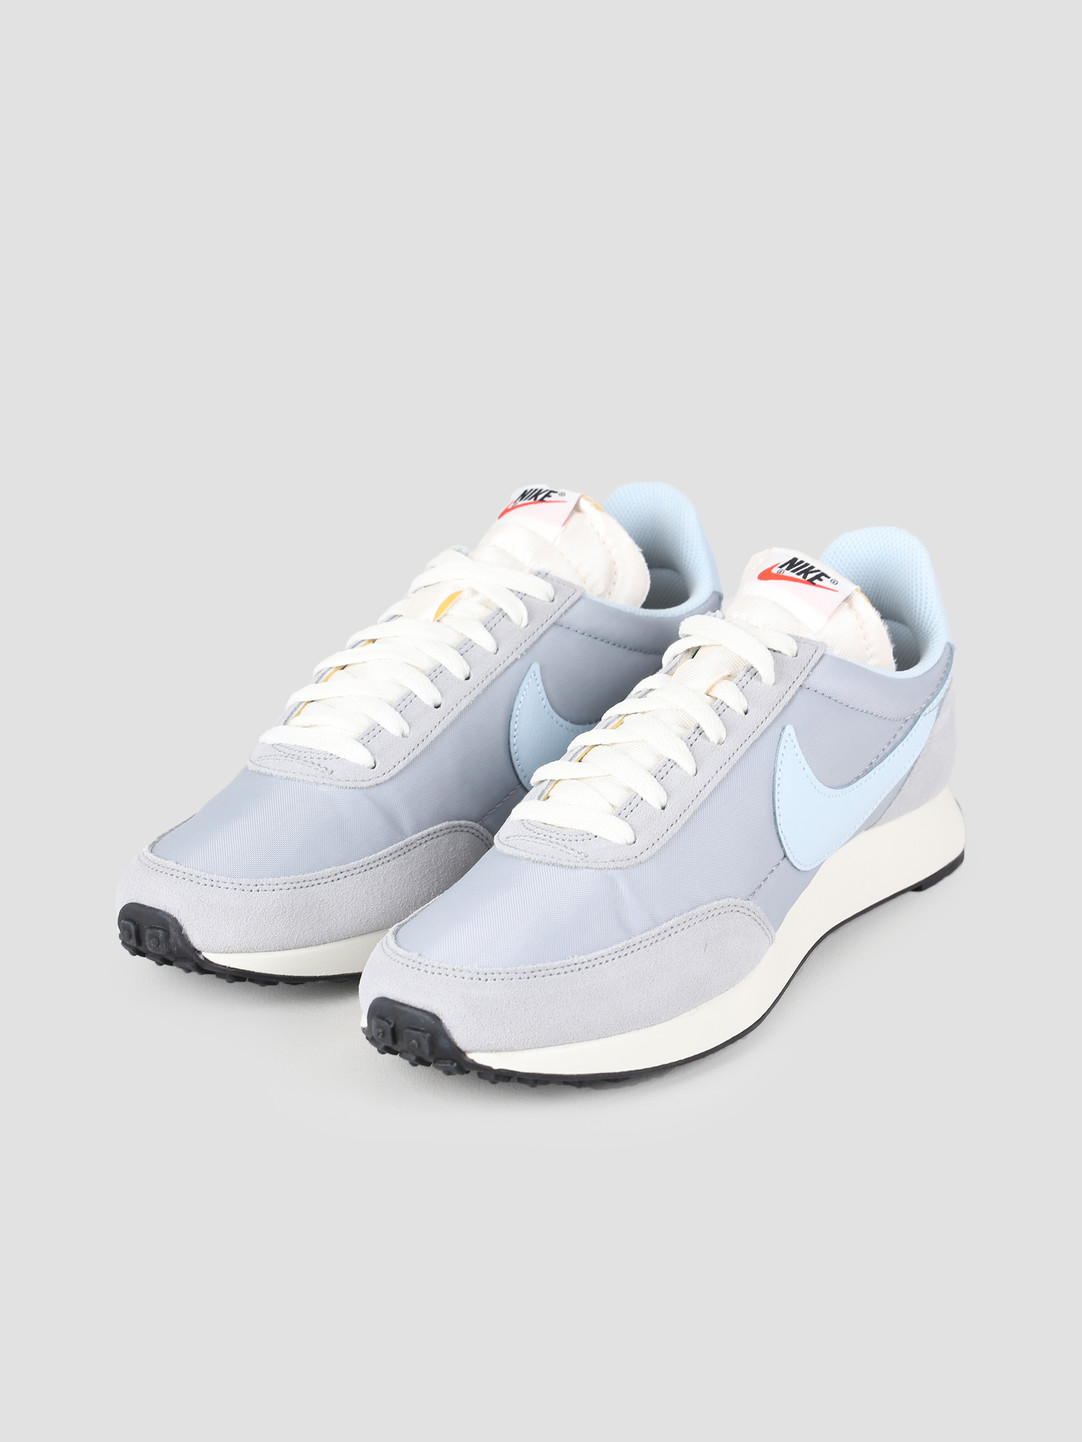 Nike Nike Air Tailwind 79 Wolf Grey Antarctica Sail Black 487754-010